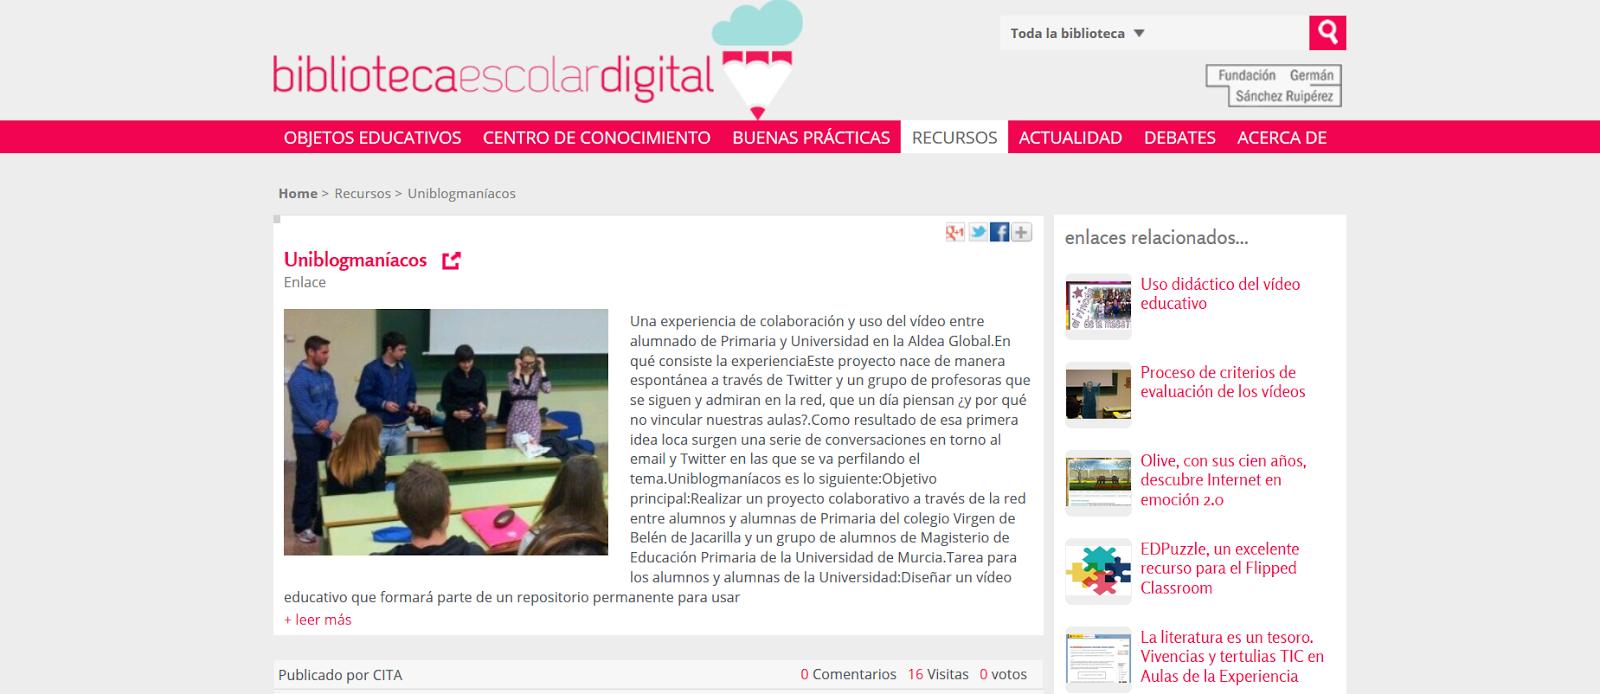 http://bibliotecaescolardigital.es/comunidad/BibliotecaEscolarDigital/recurso/uniblogmaniacos/35e2dd88-4e87-4241-bb80-26ecea4e138b